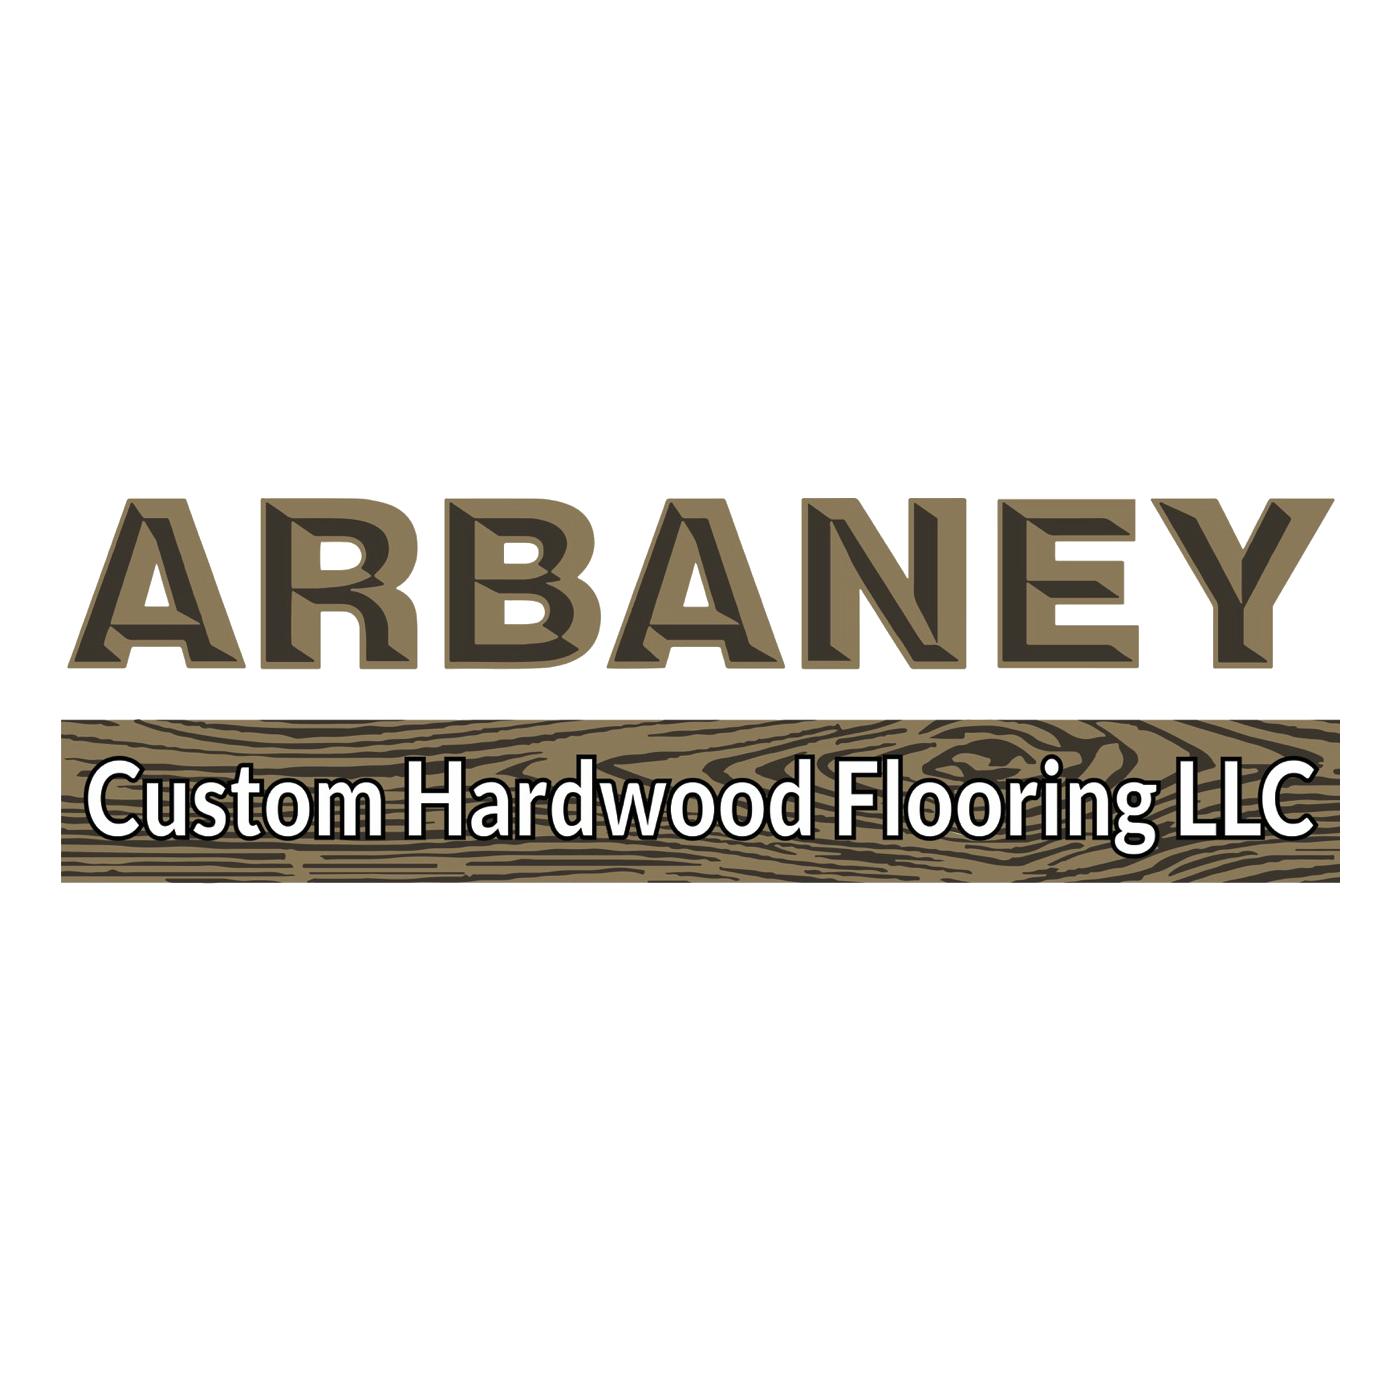 Arbaney Custom Hardwood Flooring, LLC